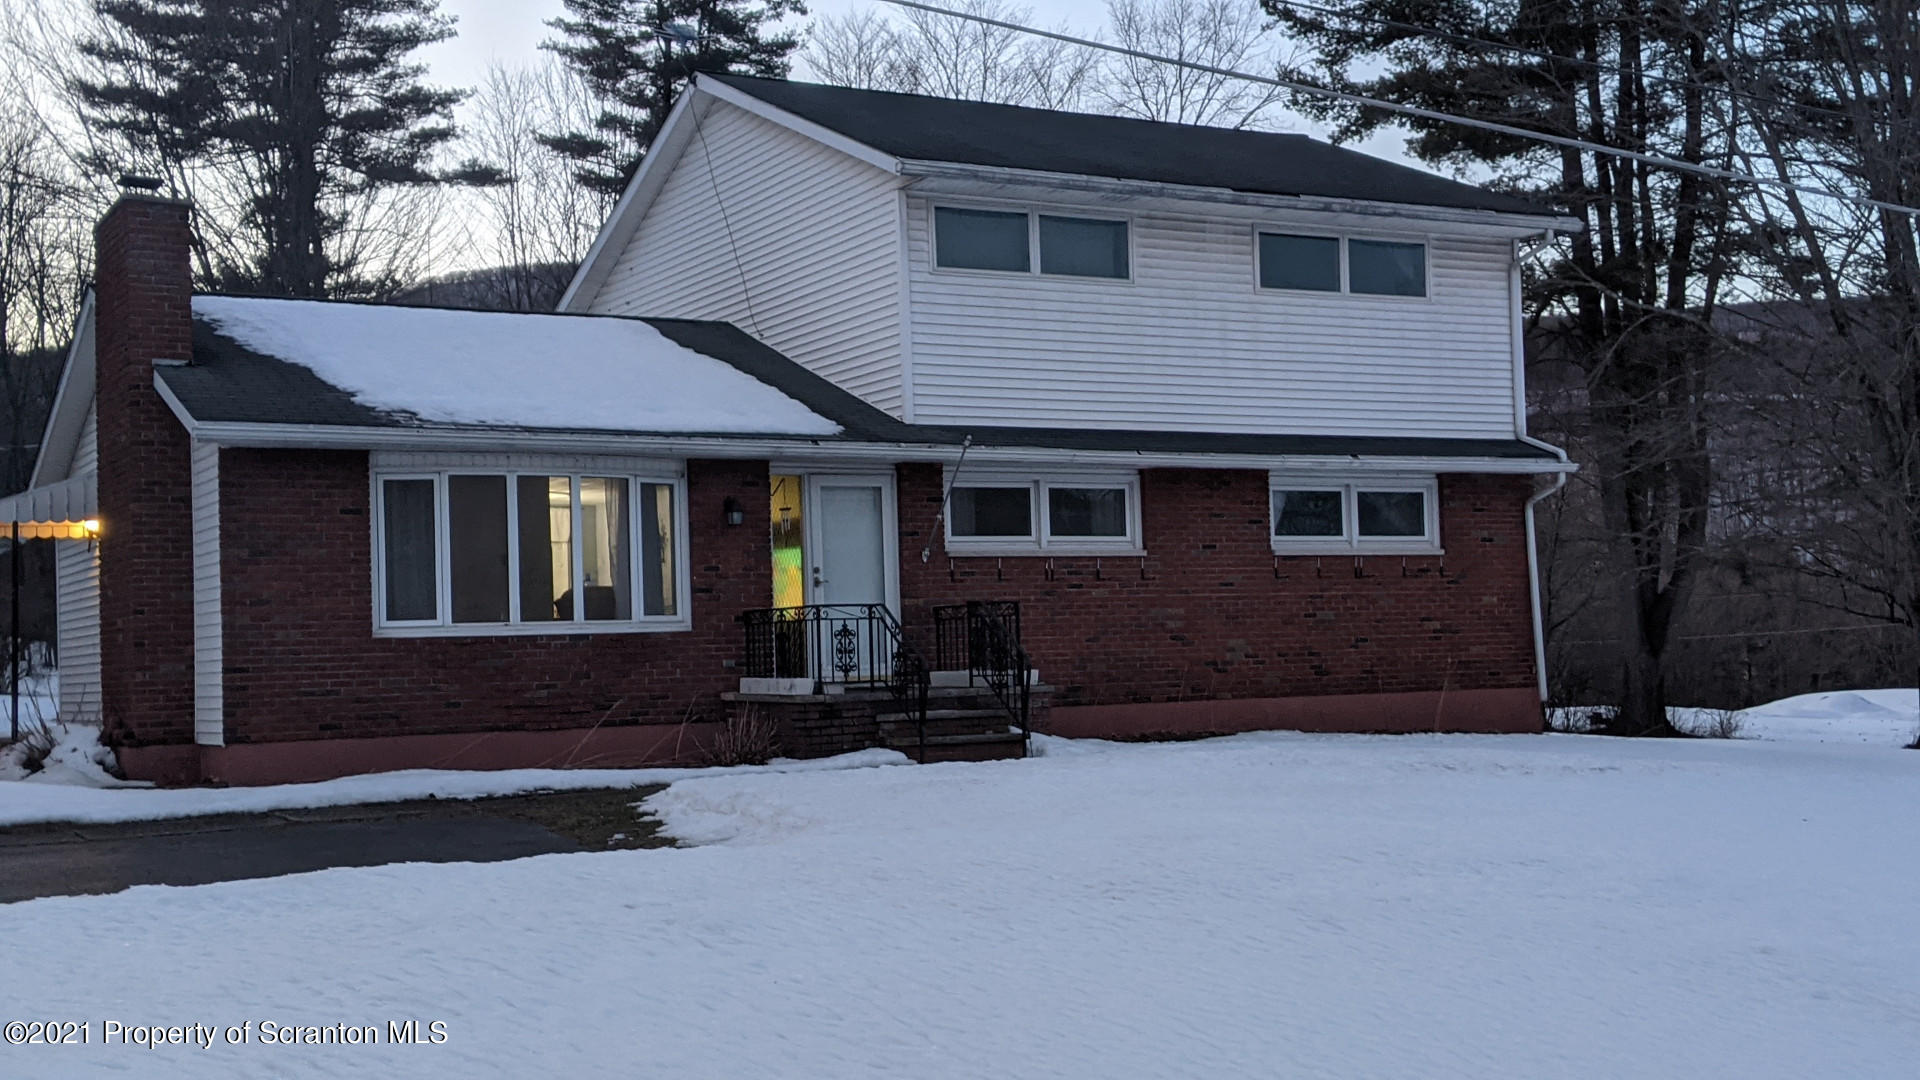 225 SR 292 E, Monroe Twp, Pennsylvania 18657, 5 Bedrooms Bedrooms, 10 Rooms Rooms,4 BathroomsBathrooms,Single Family,For Sale,SR 292 E,21-626